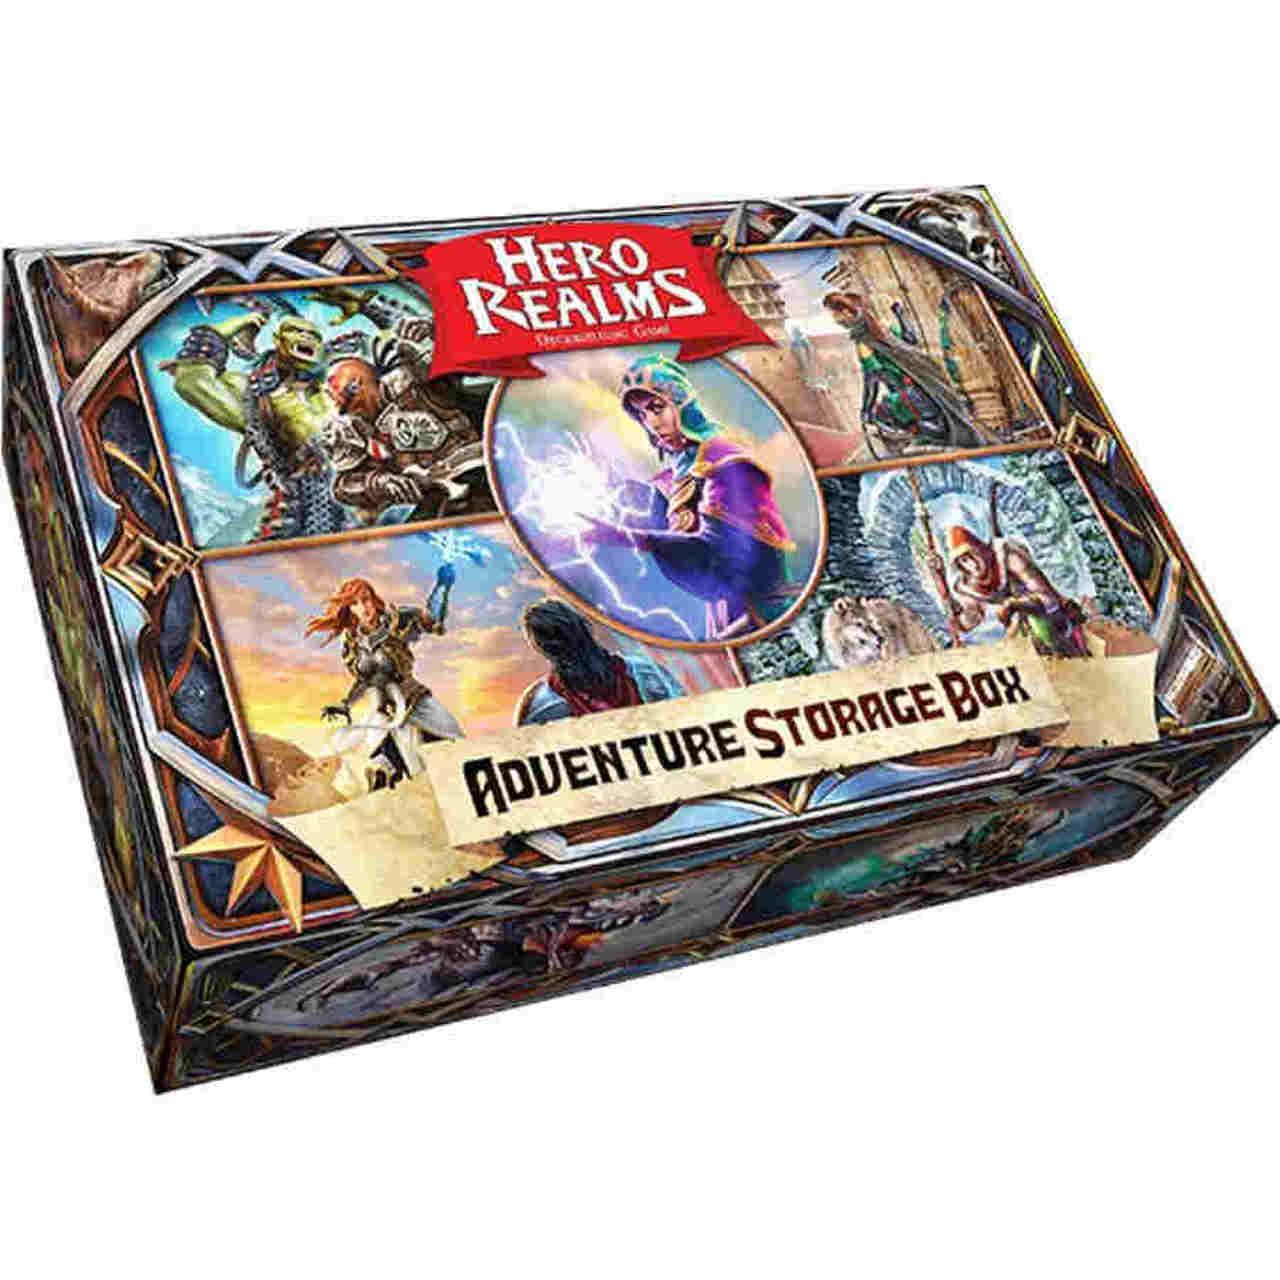 Hero Realms Adventure Storage Box